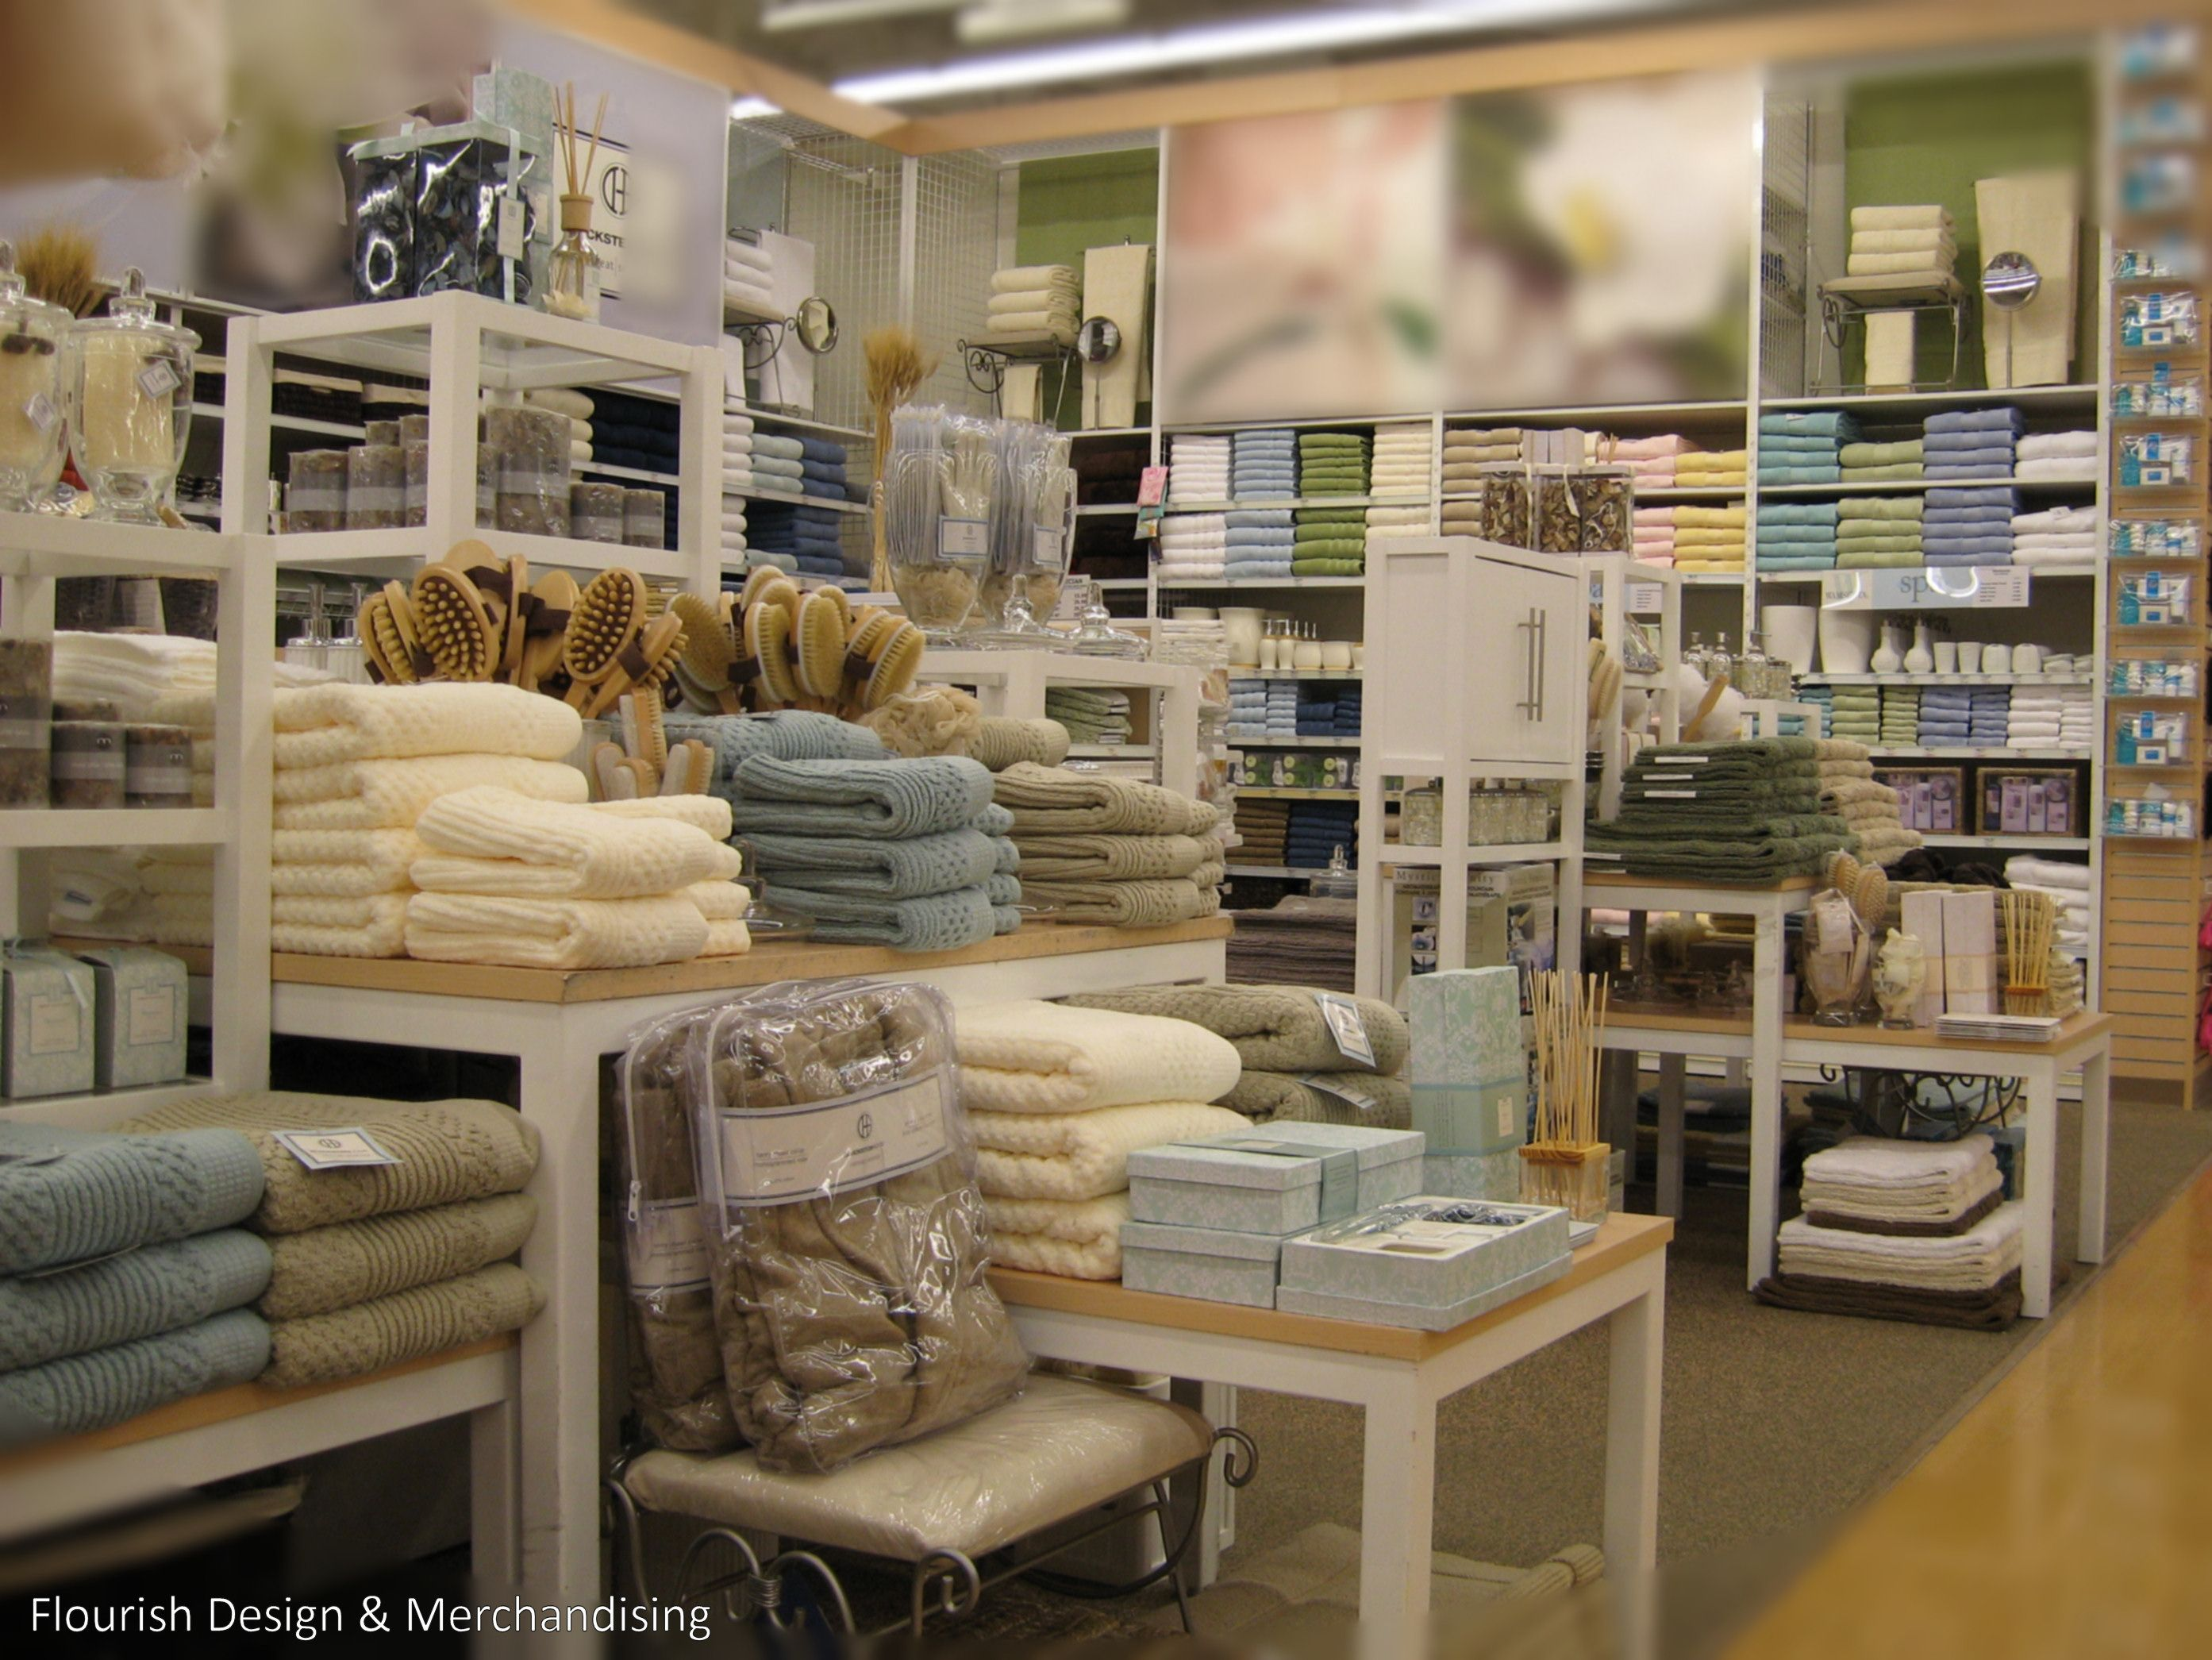 Spa By Melissa Of Flourish Design U0026 Merchandising. Visual Merchandising,  Display, Bath And